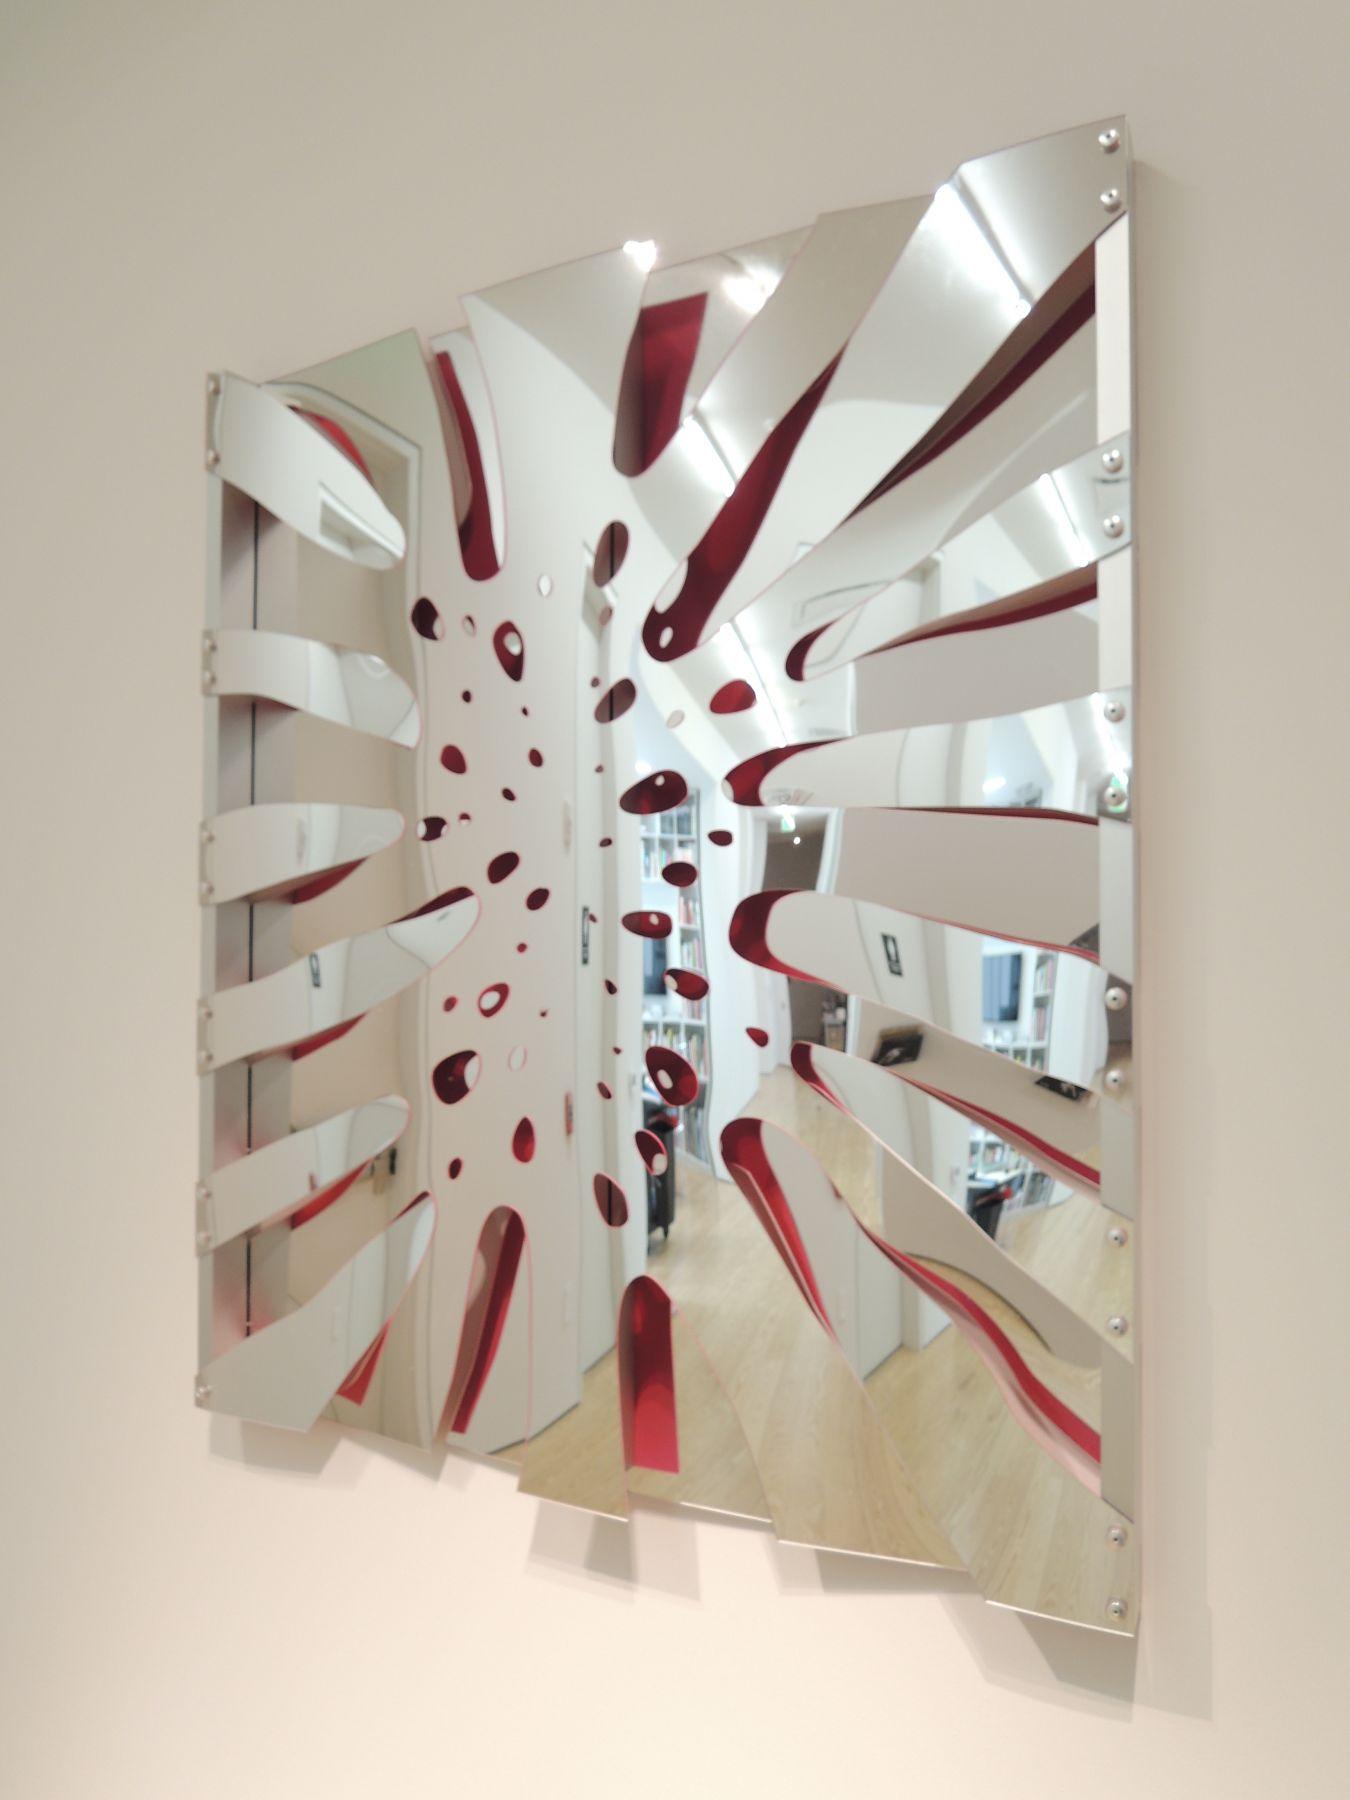 Thomas Glassford.(b. 1963, USA/Mexico).Untitled, 2014.Mirrored Plexiglas and anondized aluminum 48 1/32 x 41 x 2 11/32 in. (122 x 104.1 x 6 cm.)